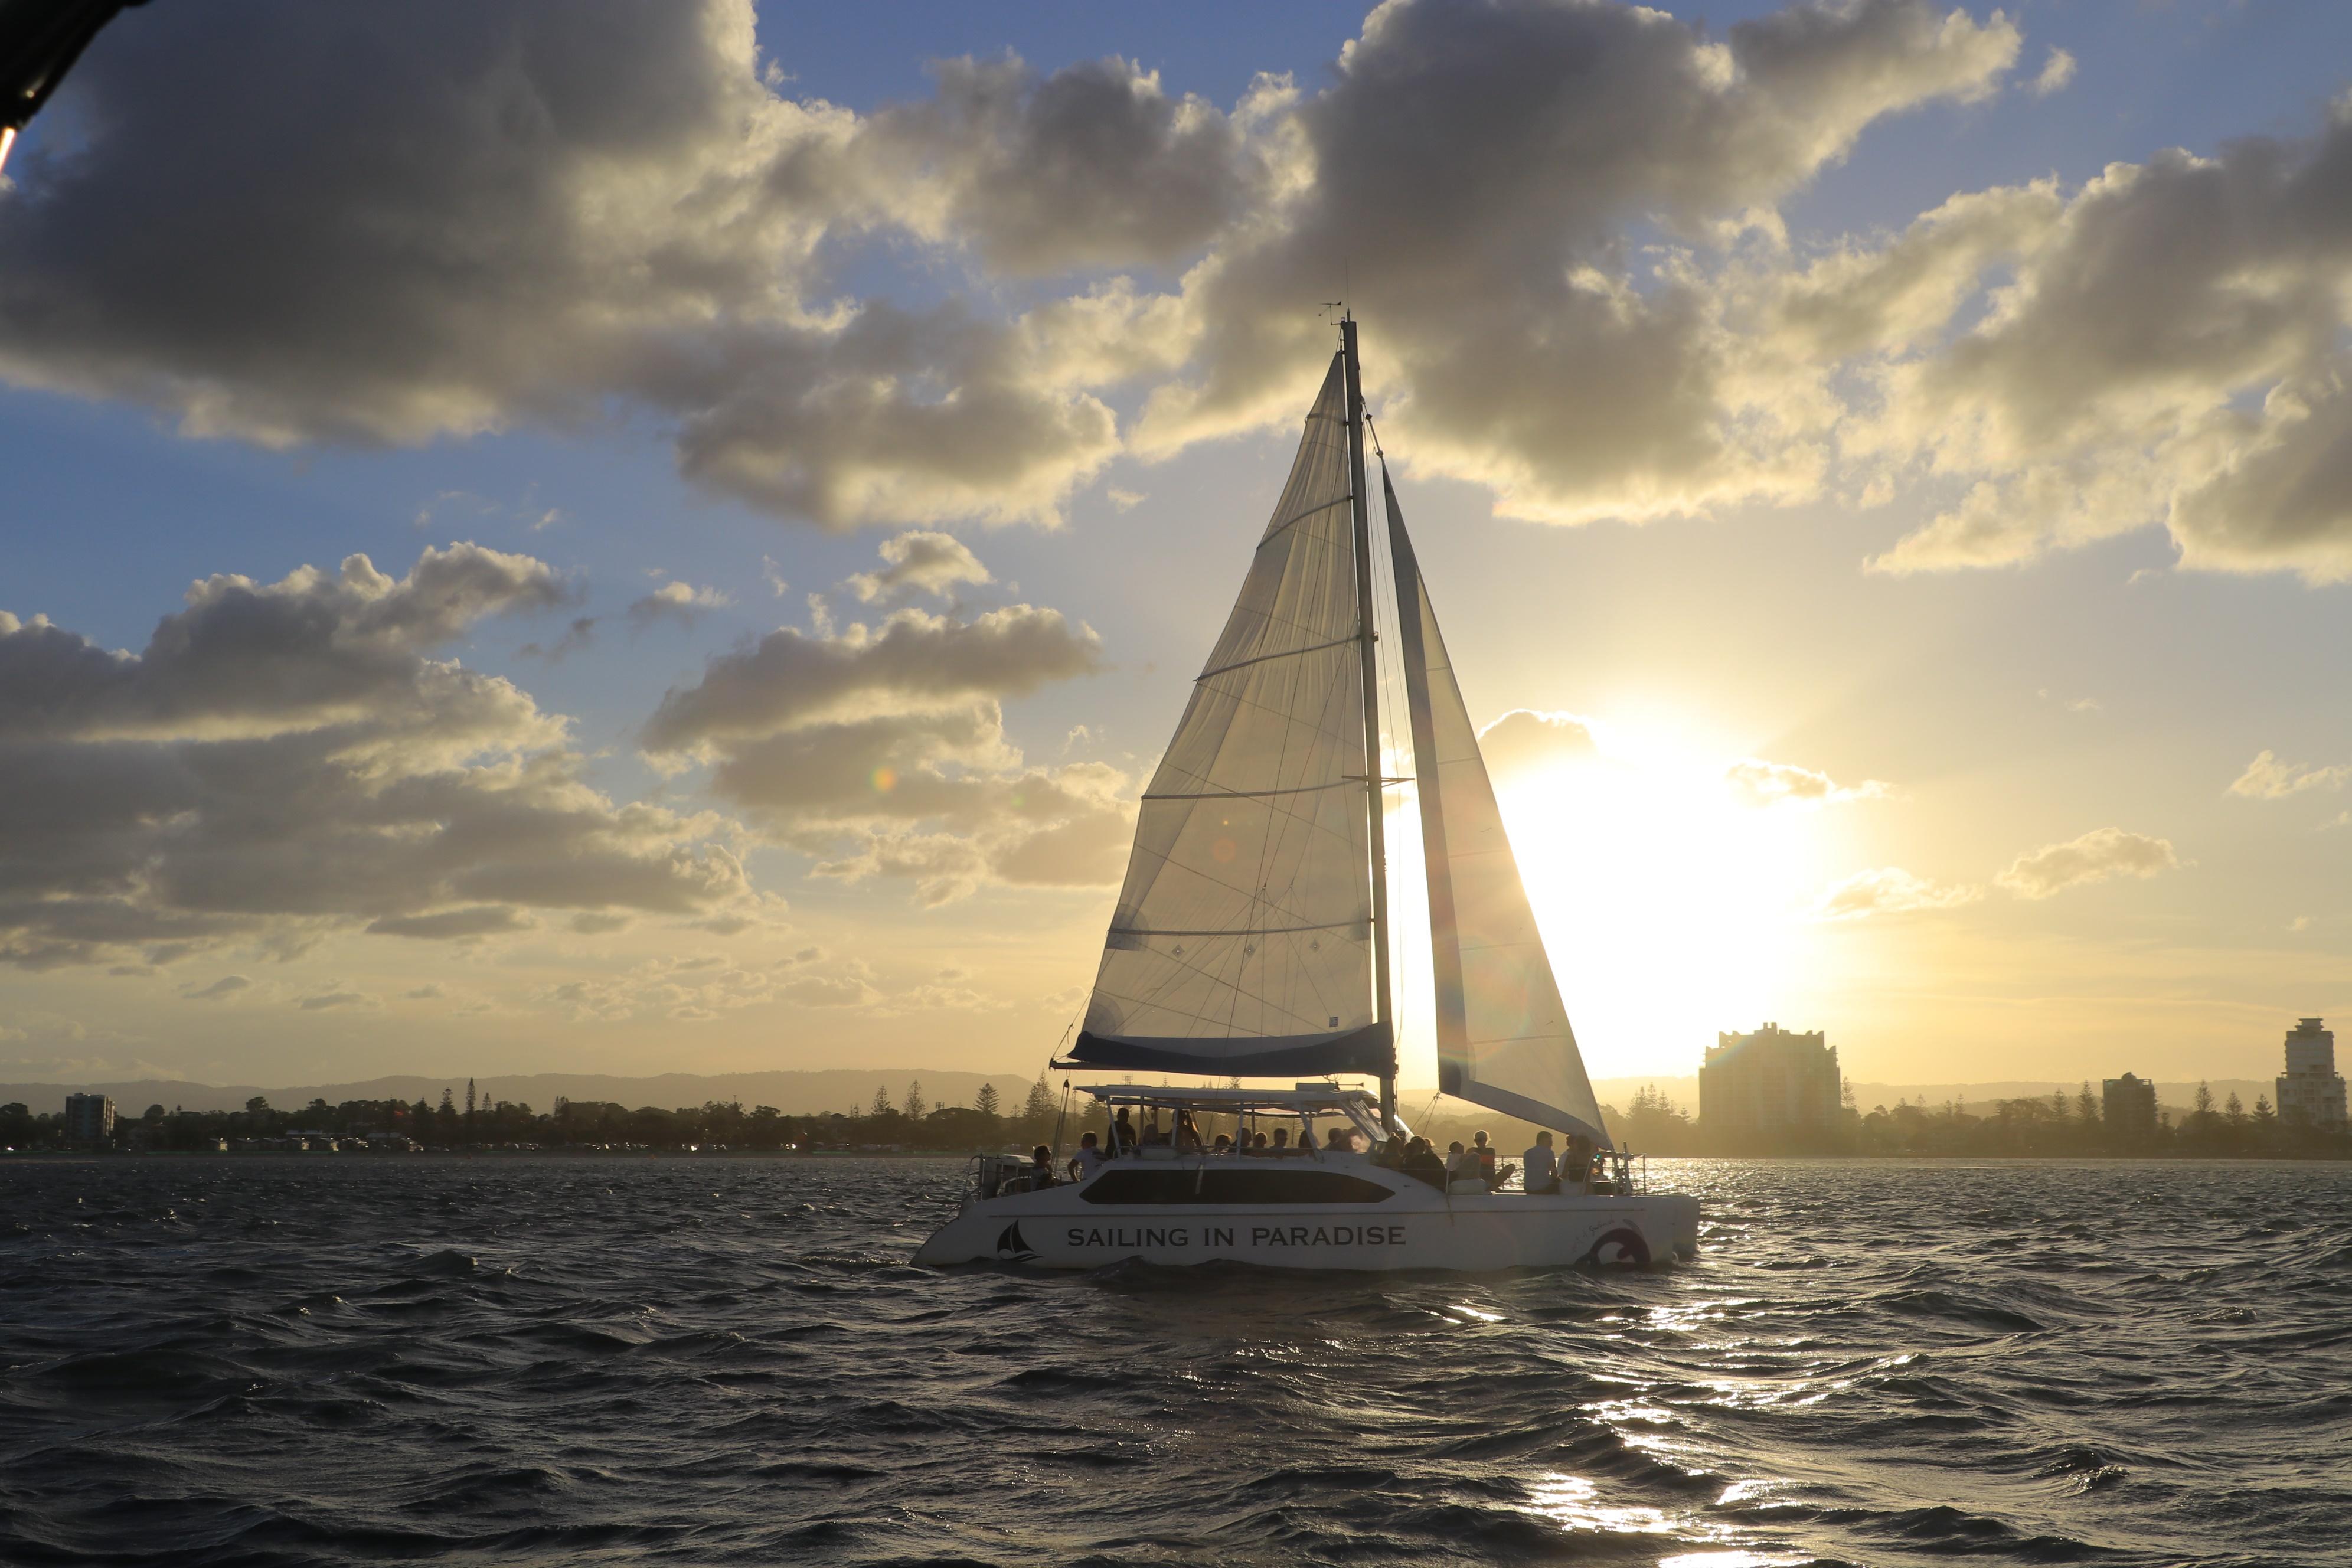 Gold Coast Sunset & City Lights Cruise - 2 hours